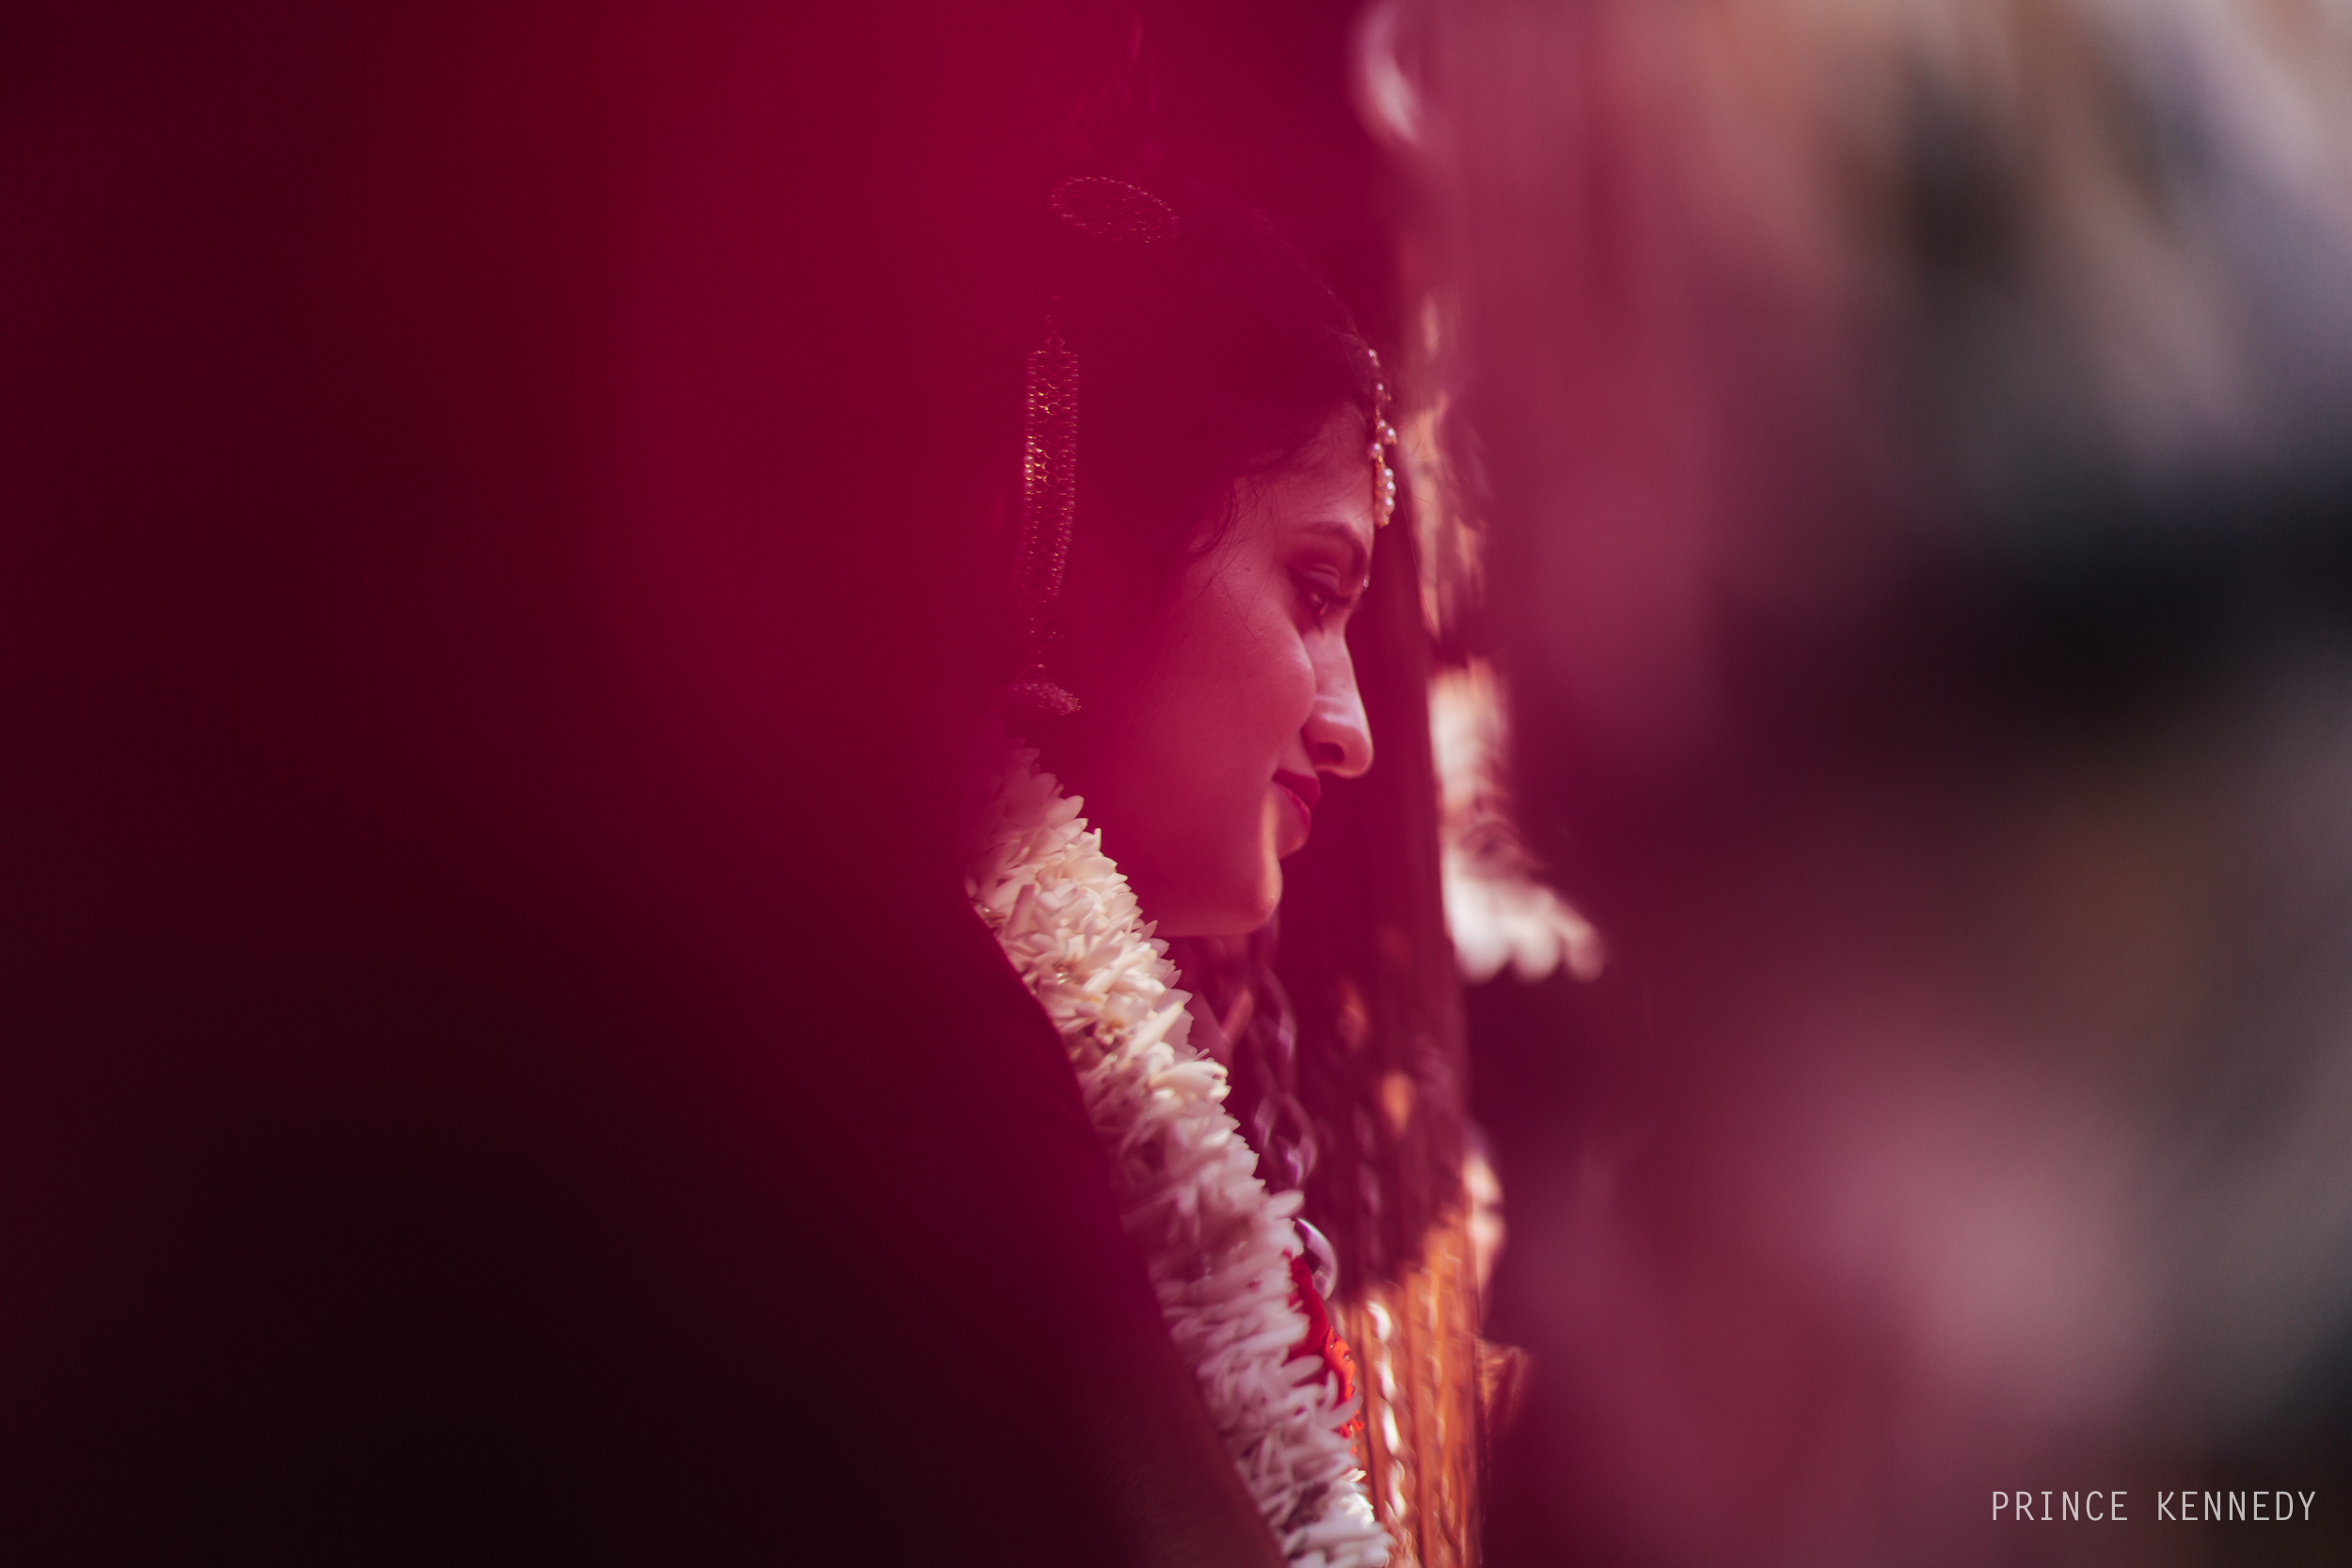 Athmajja-Nithesh-Engagement-Couple-Portrait-Portraiture-Wedding-Couple-Portrait-Chennai-Photographer-Candid-Photography-Destination-Best-Prince-Kennedy-Photography-165.jpg